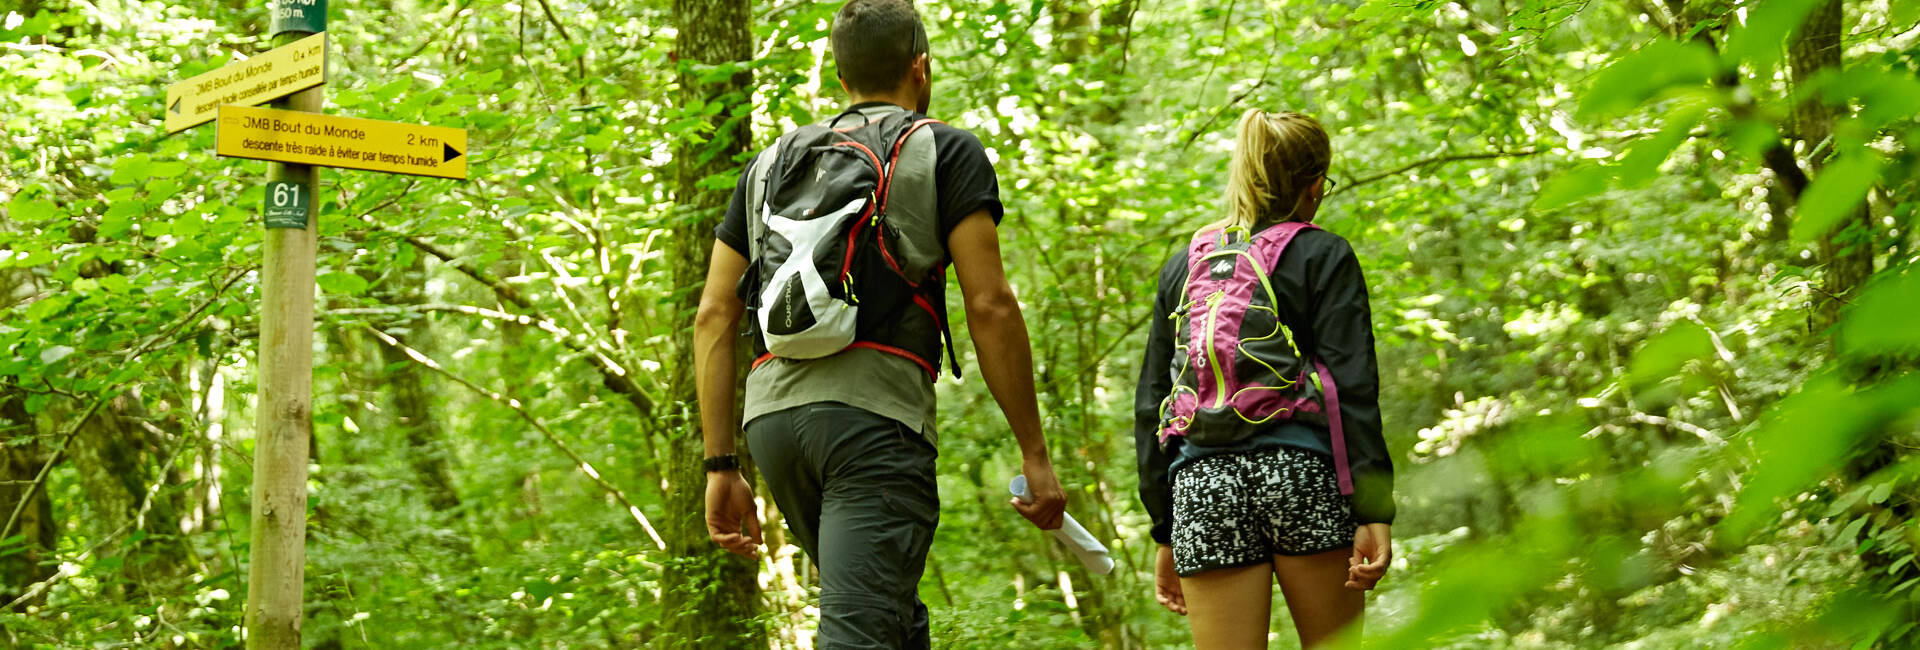 Hiking - walking and cycling around Beaune © Studio Piffaut